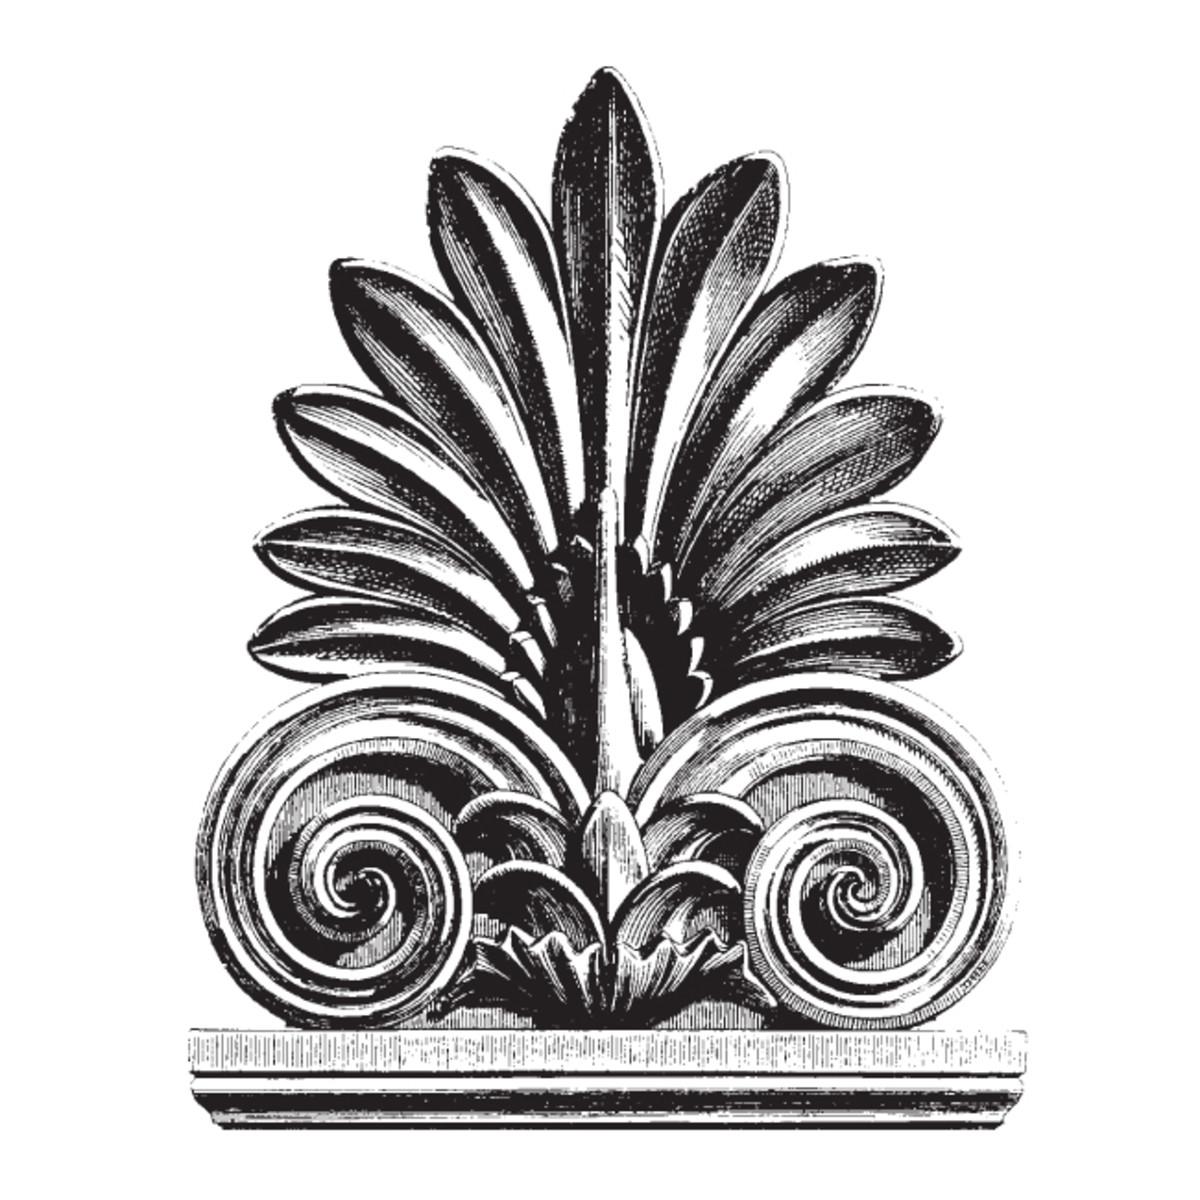 palladio awards